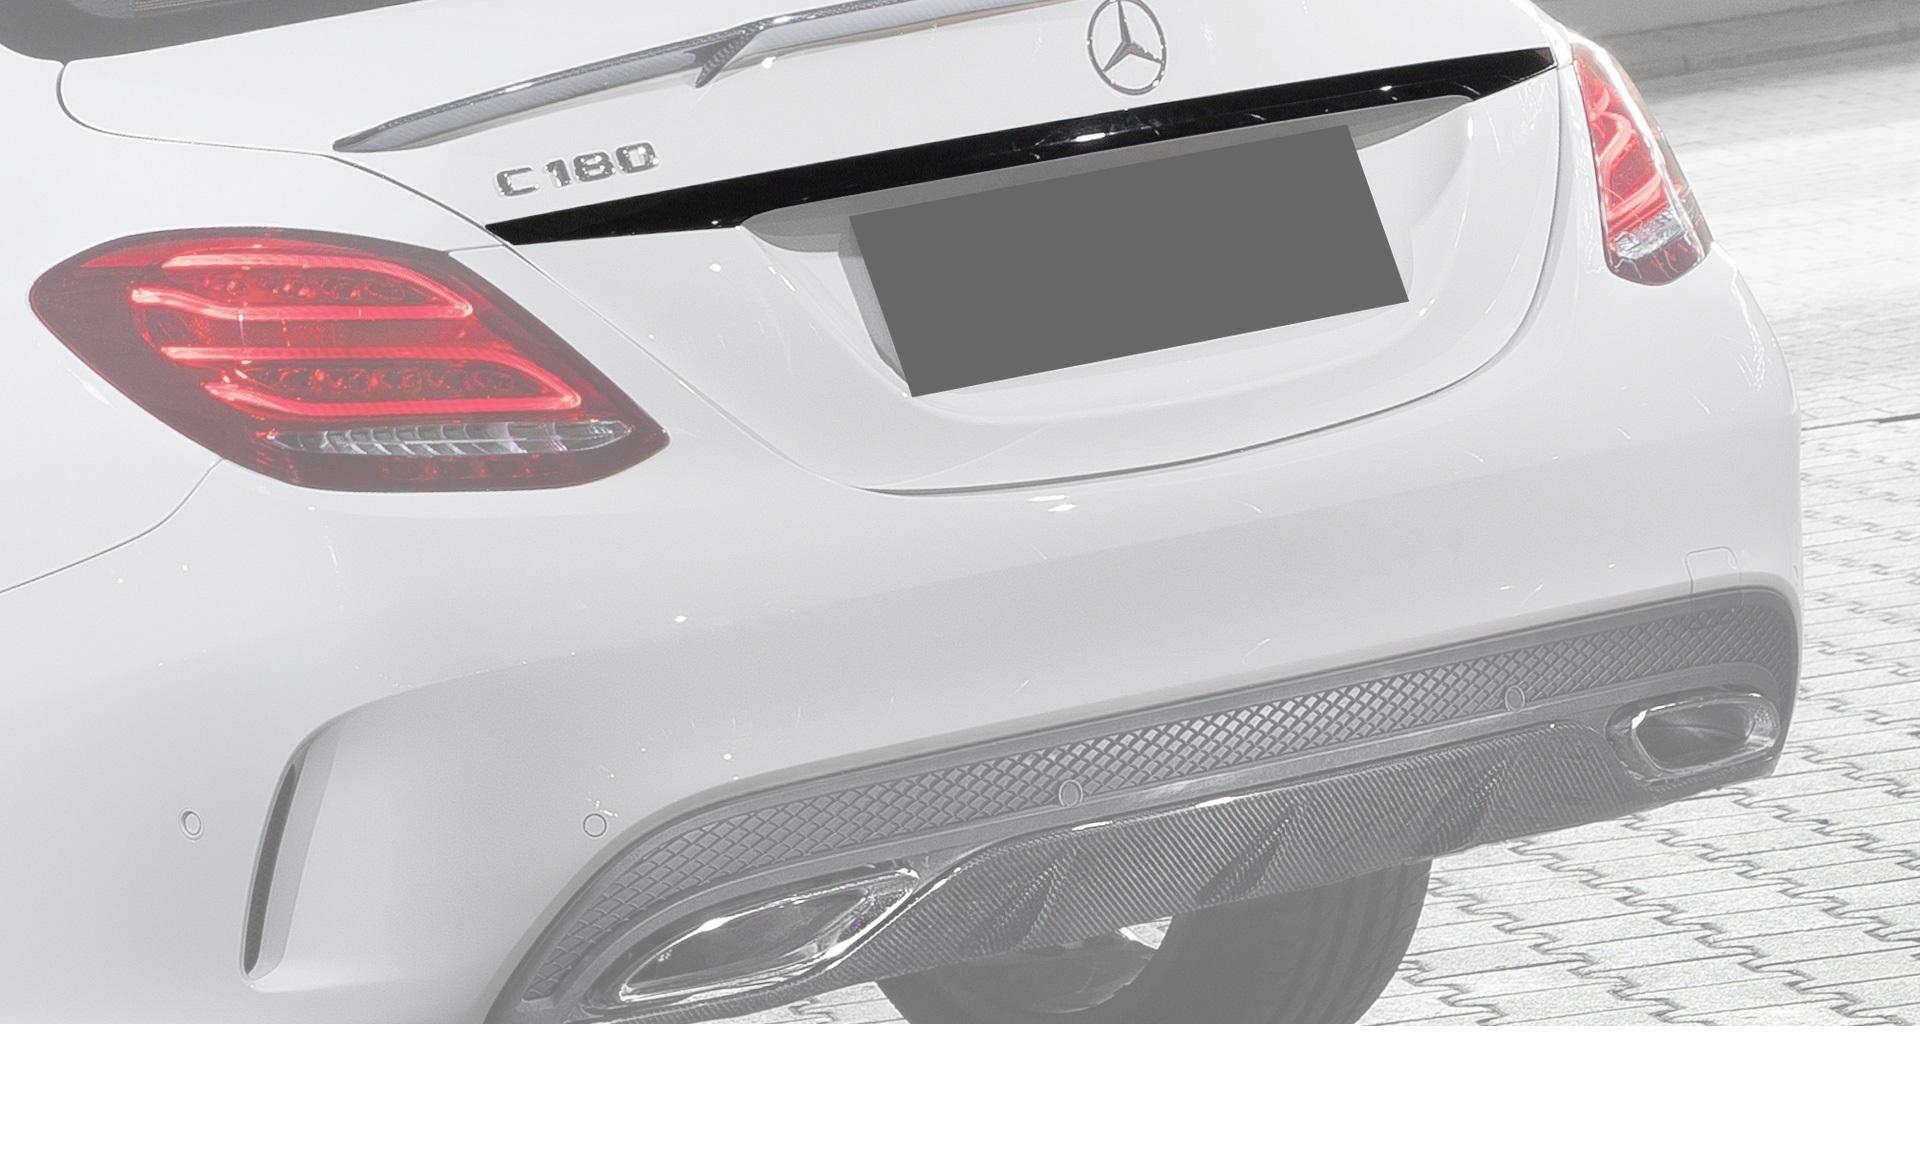 Карбоновая накладка на багажник над номером Brabus Style для Mercedes С-class W205